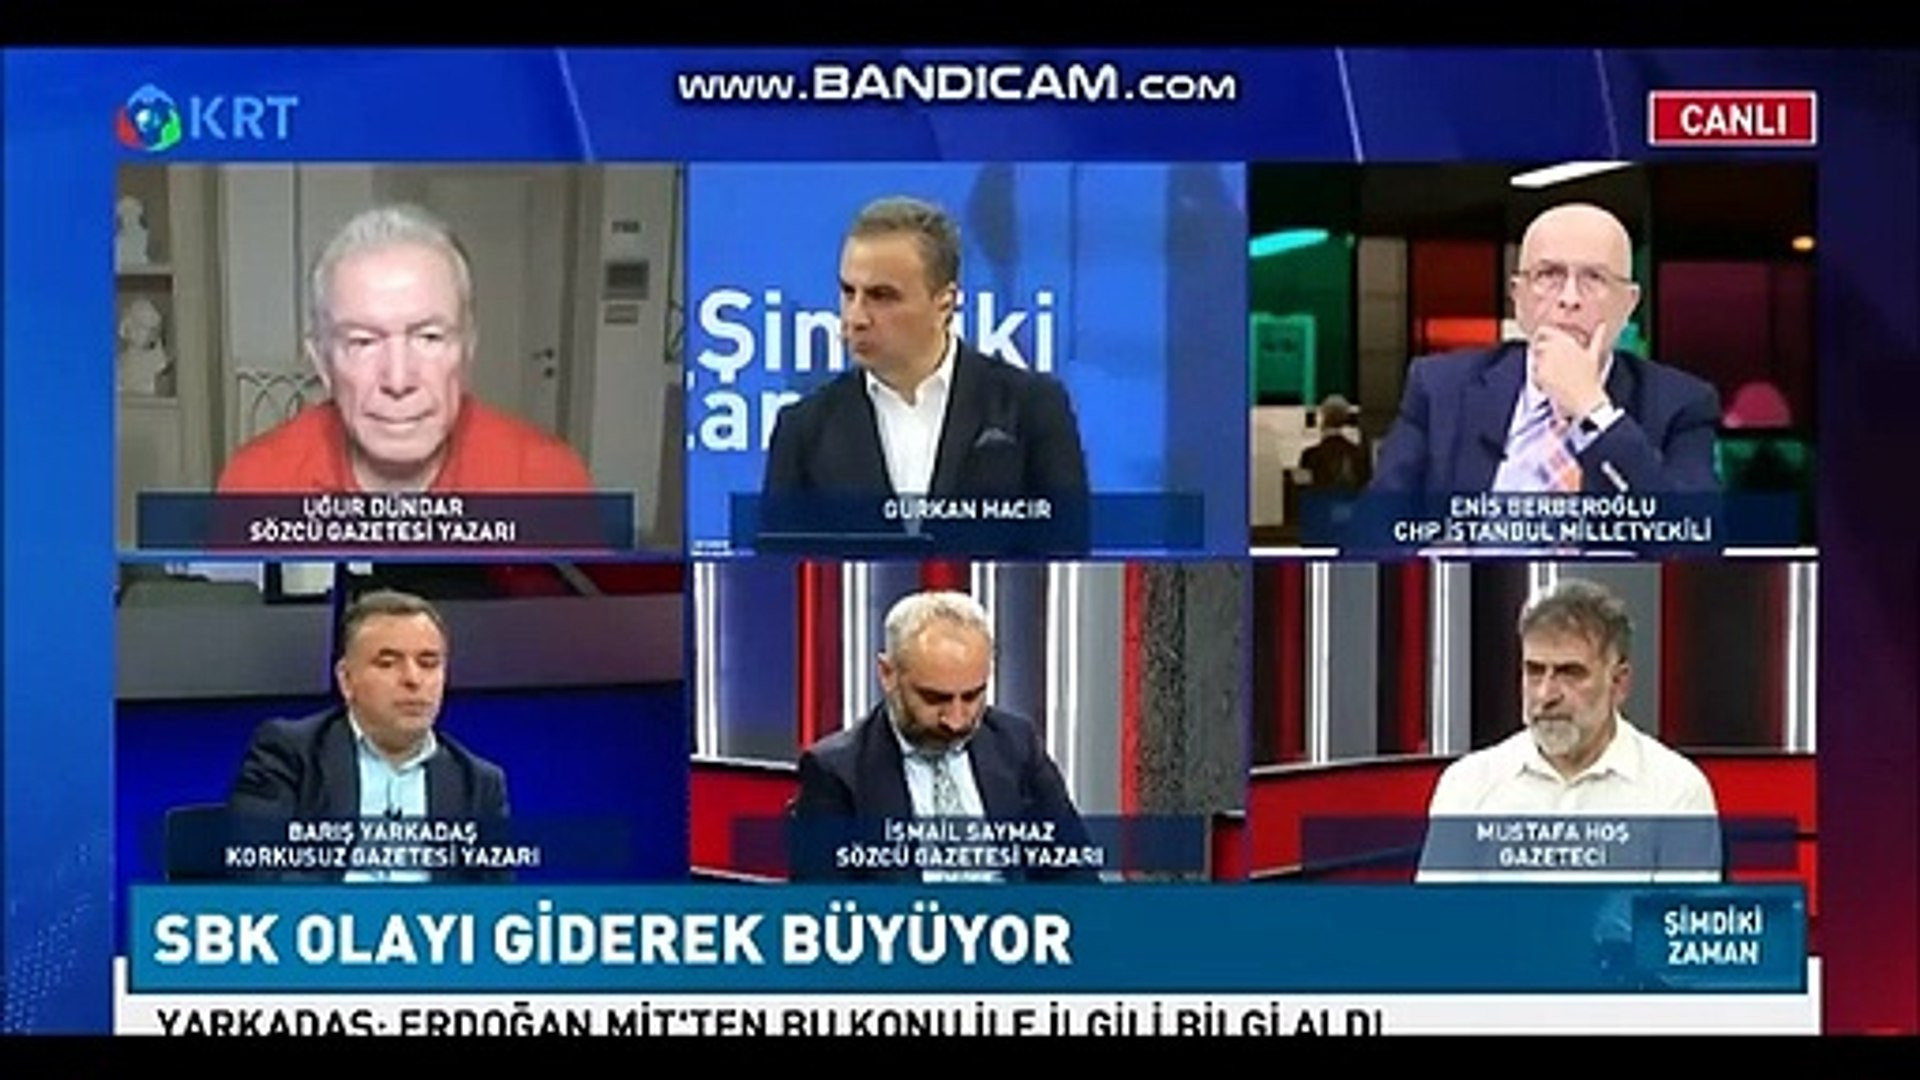 Canlı yayında olay iddia: ''Erdoğan, Soylu'nun üstünü çizdi''